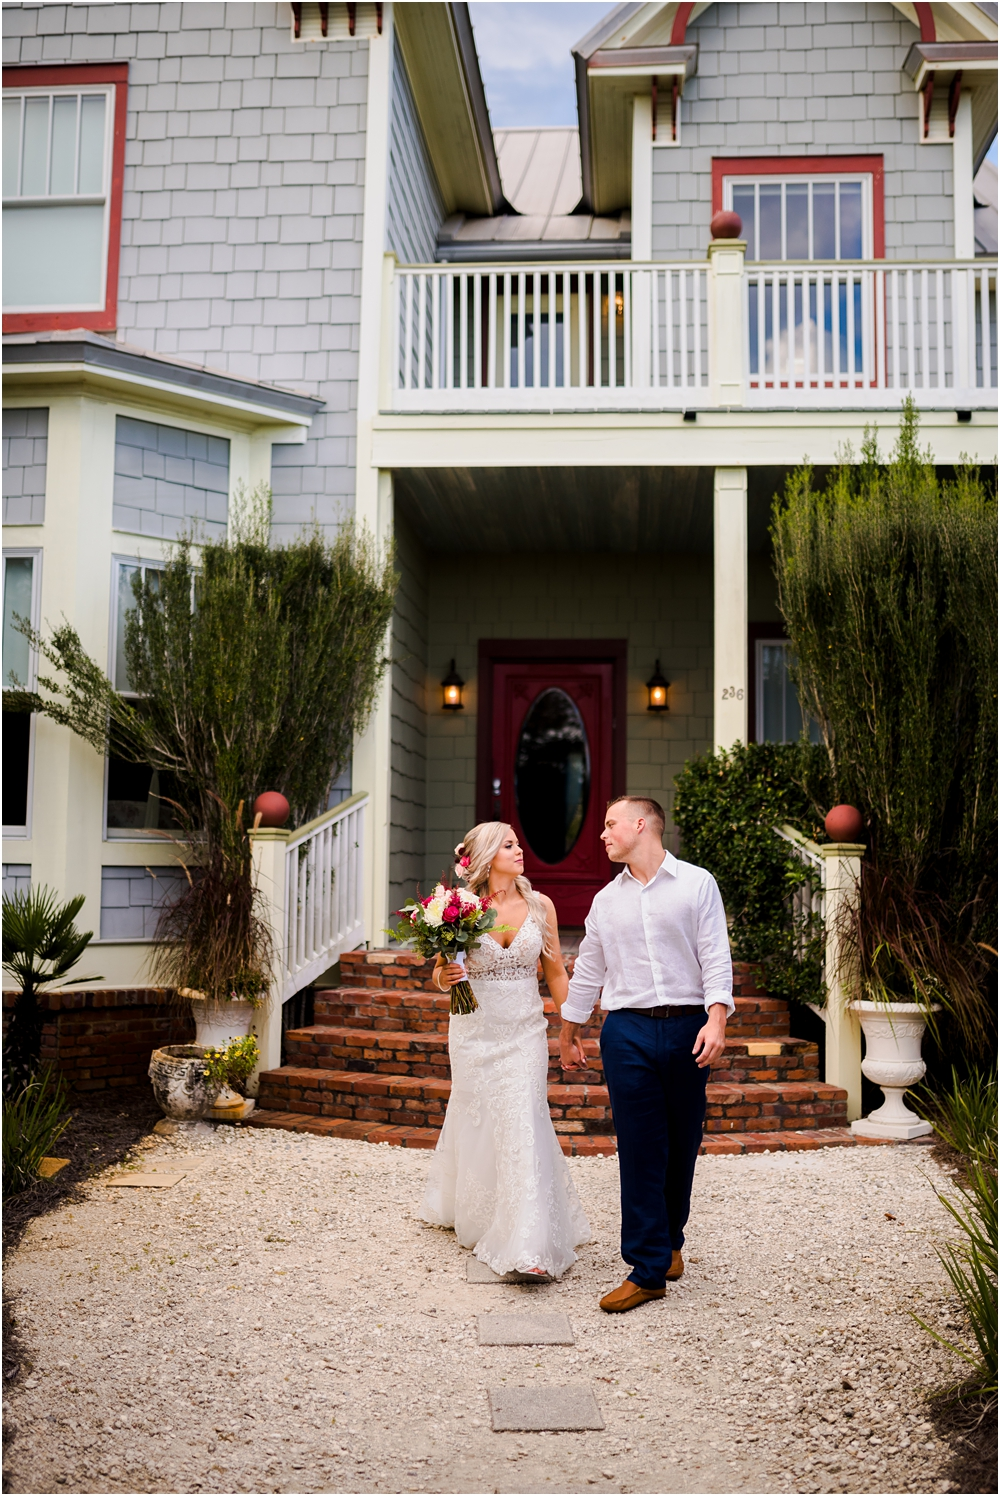 mcglothlin-wedding-kiersten-stevenson-photography-30a-panama-city-beach-dothan-tallahassee-(58-of-145).jpg